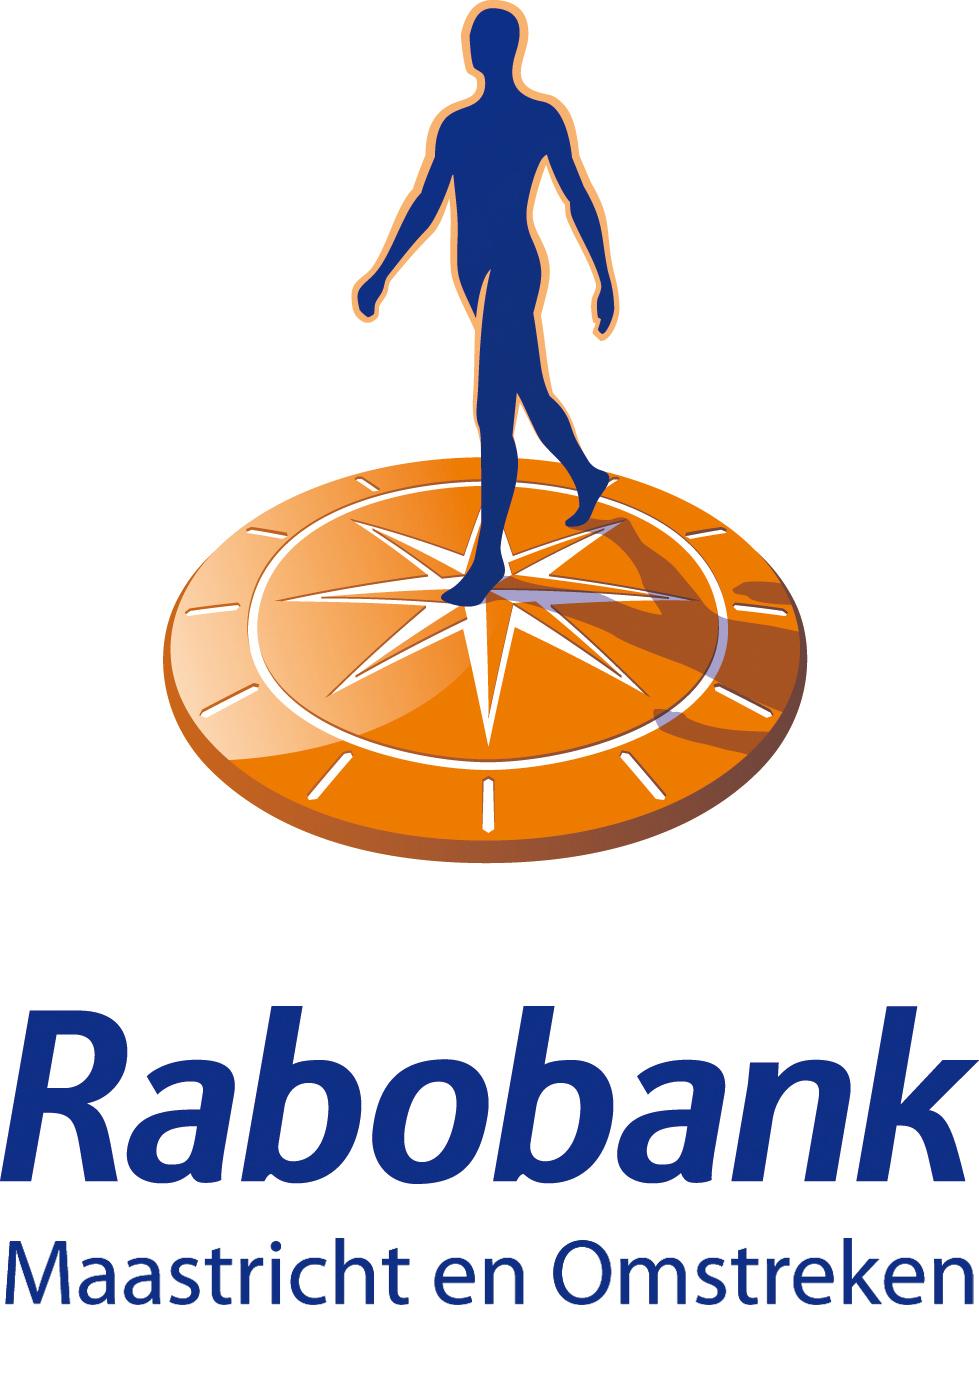 Rabobank Maastricht